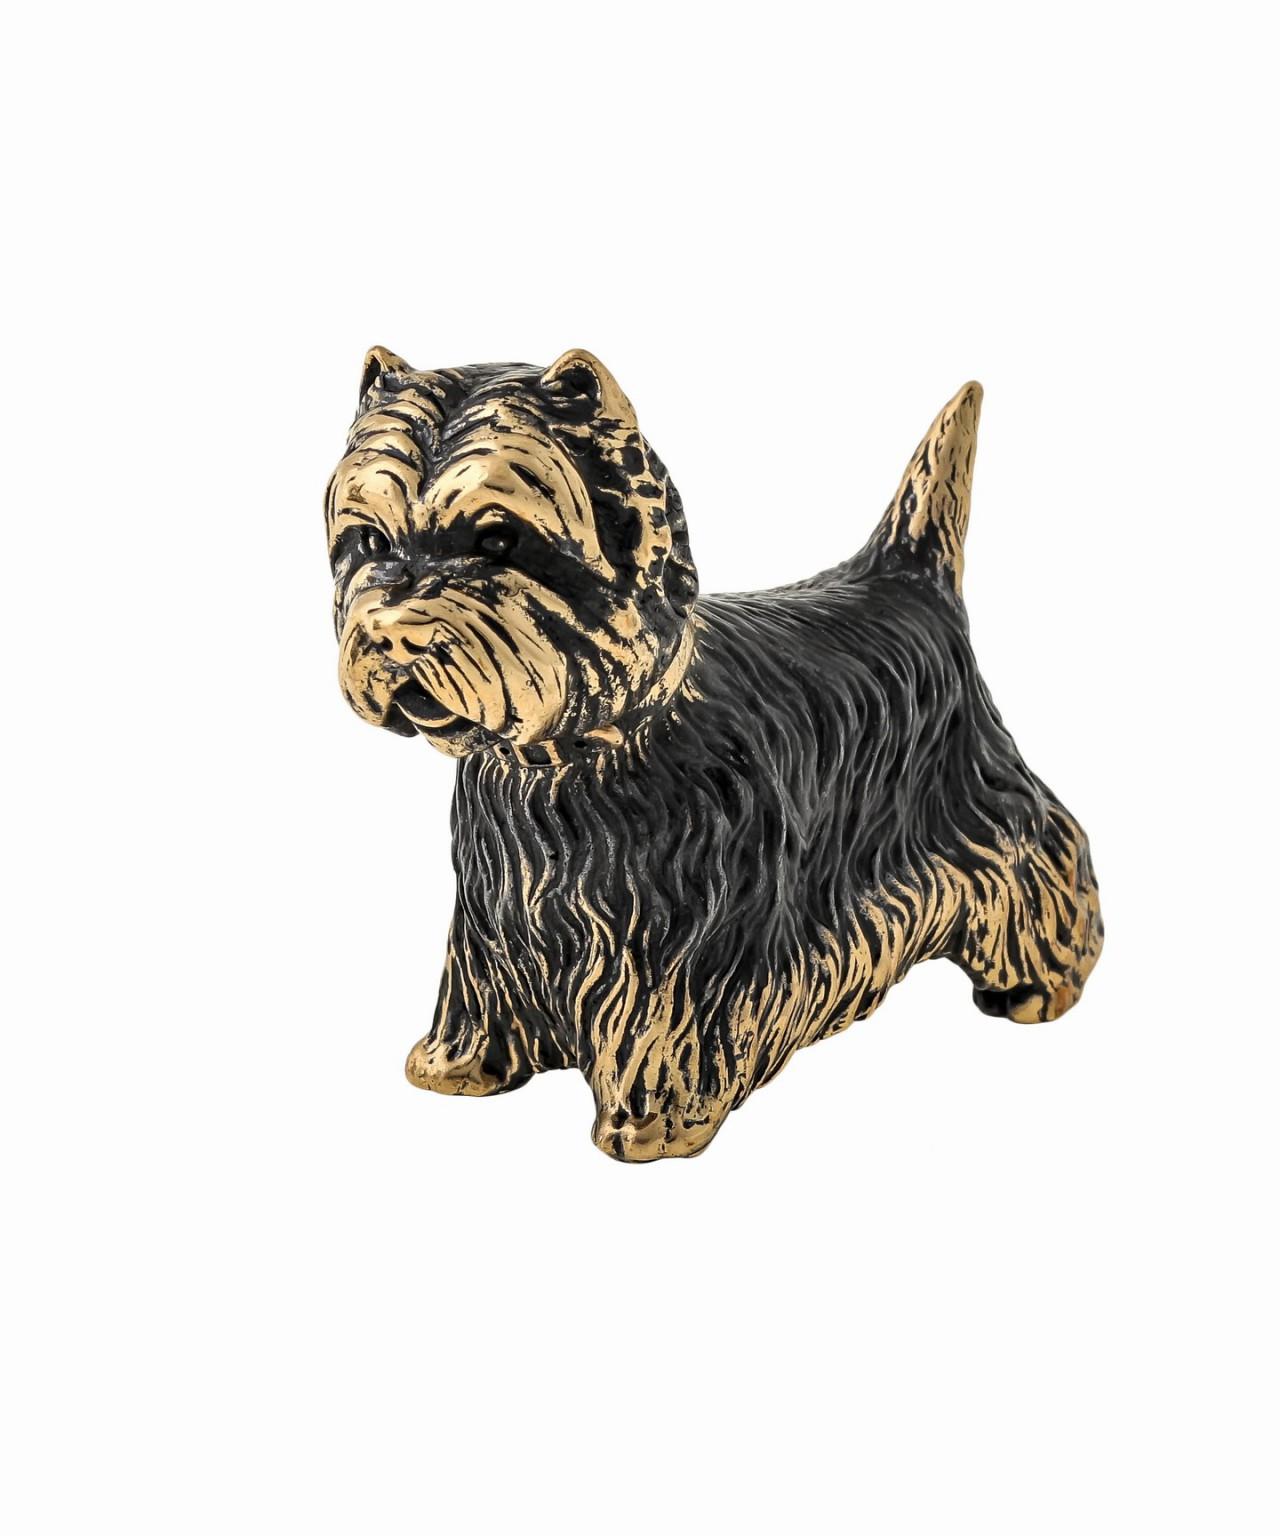 Собака Вест-хайленд-уайт терьер б/п 1497.1